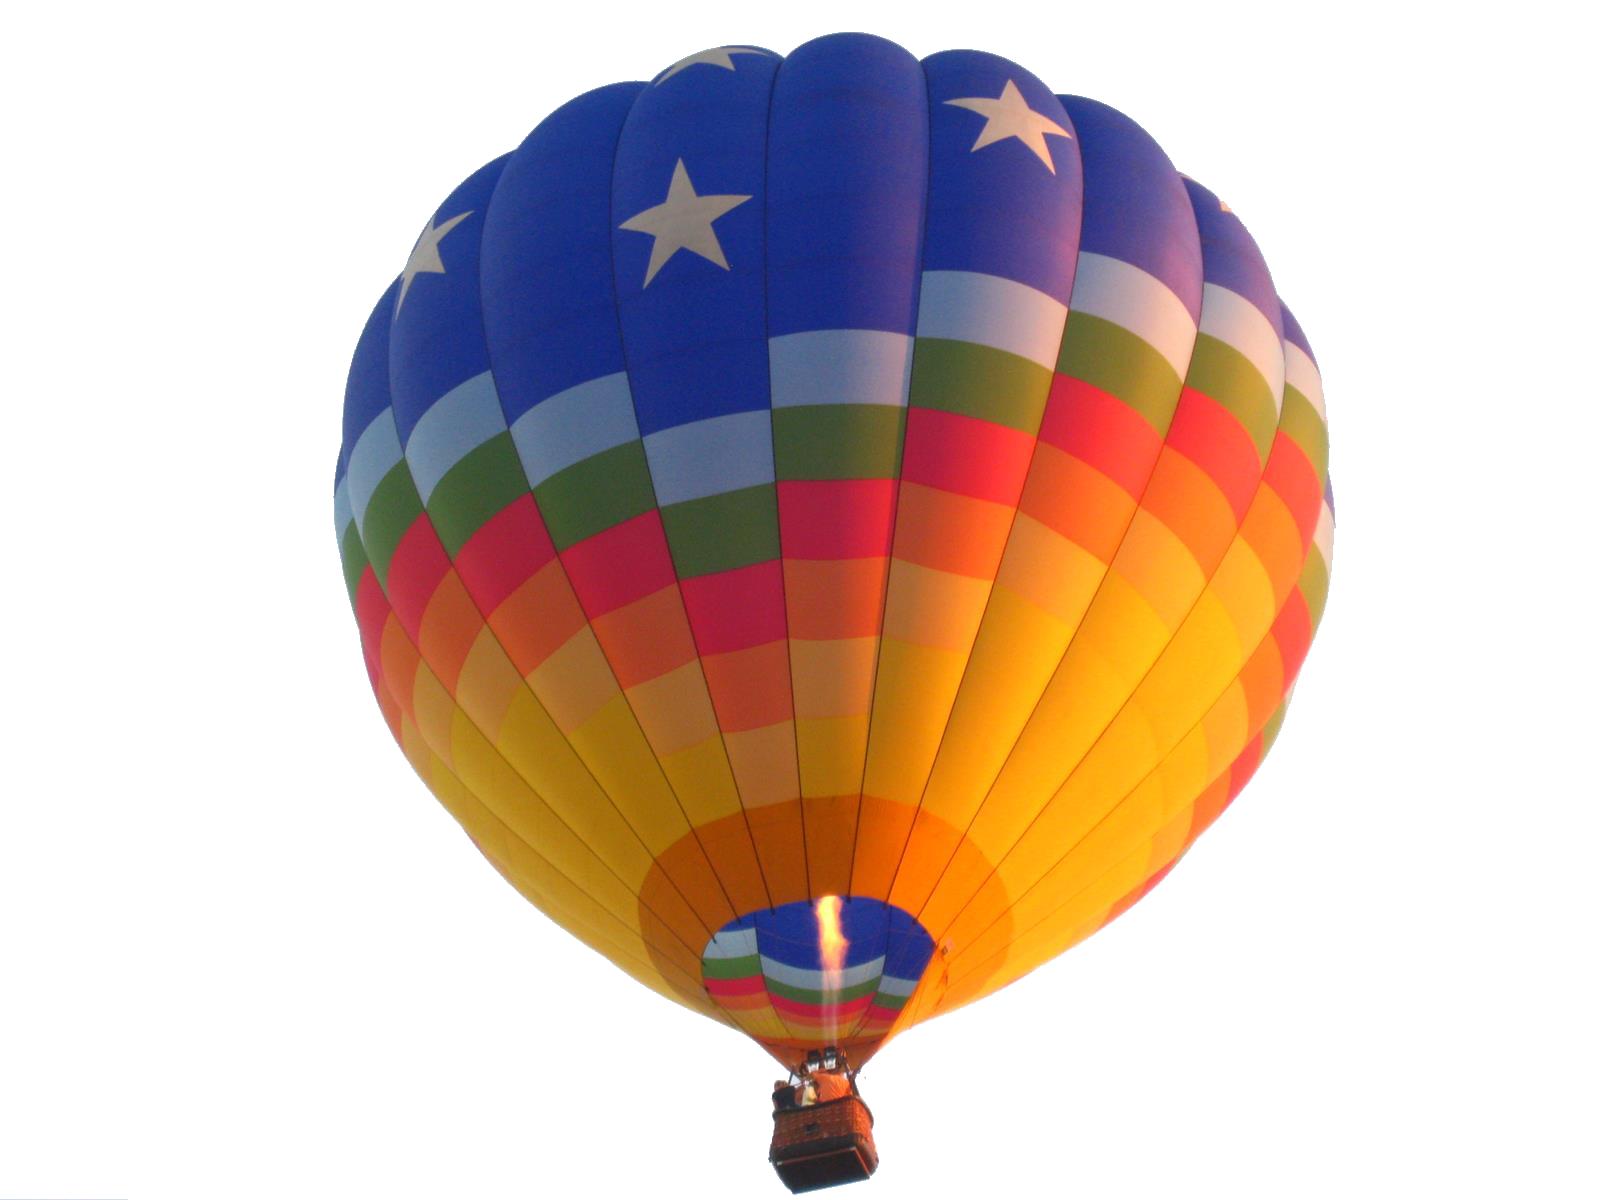 hot air balloon rides orlando aerostat adventures. Black Bedroom Furniture Sets. Home Design Ideas